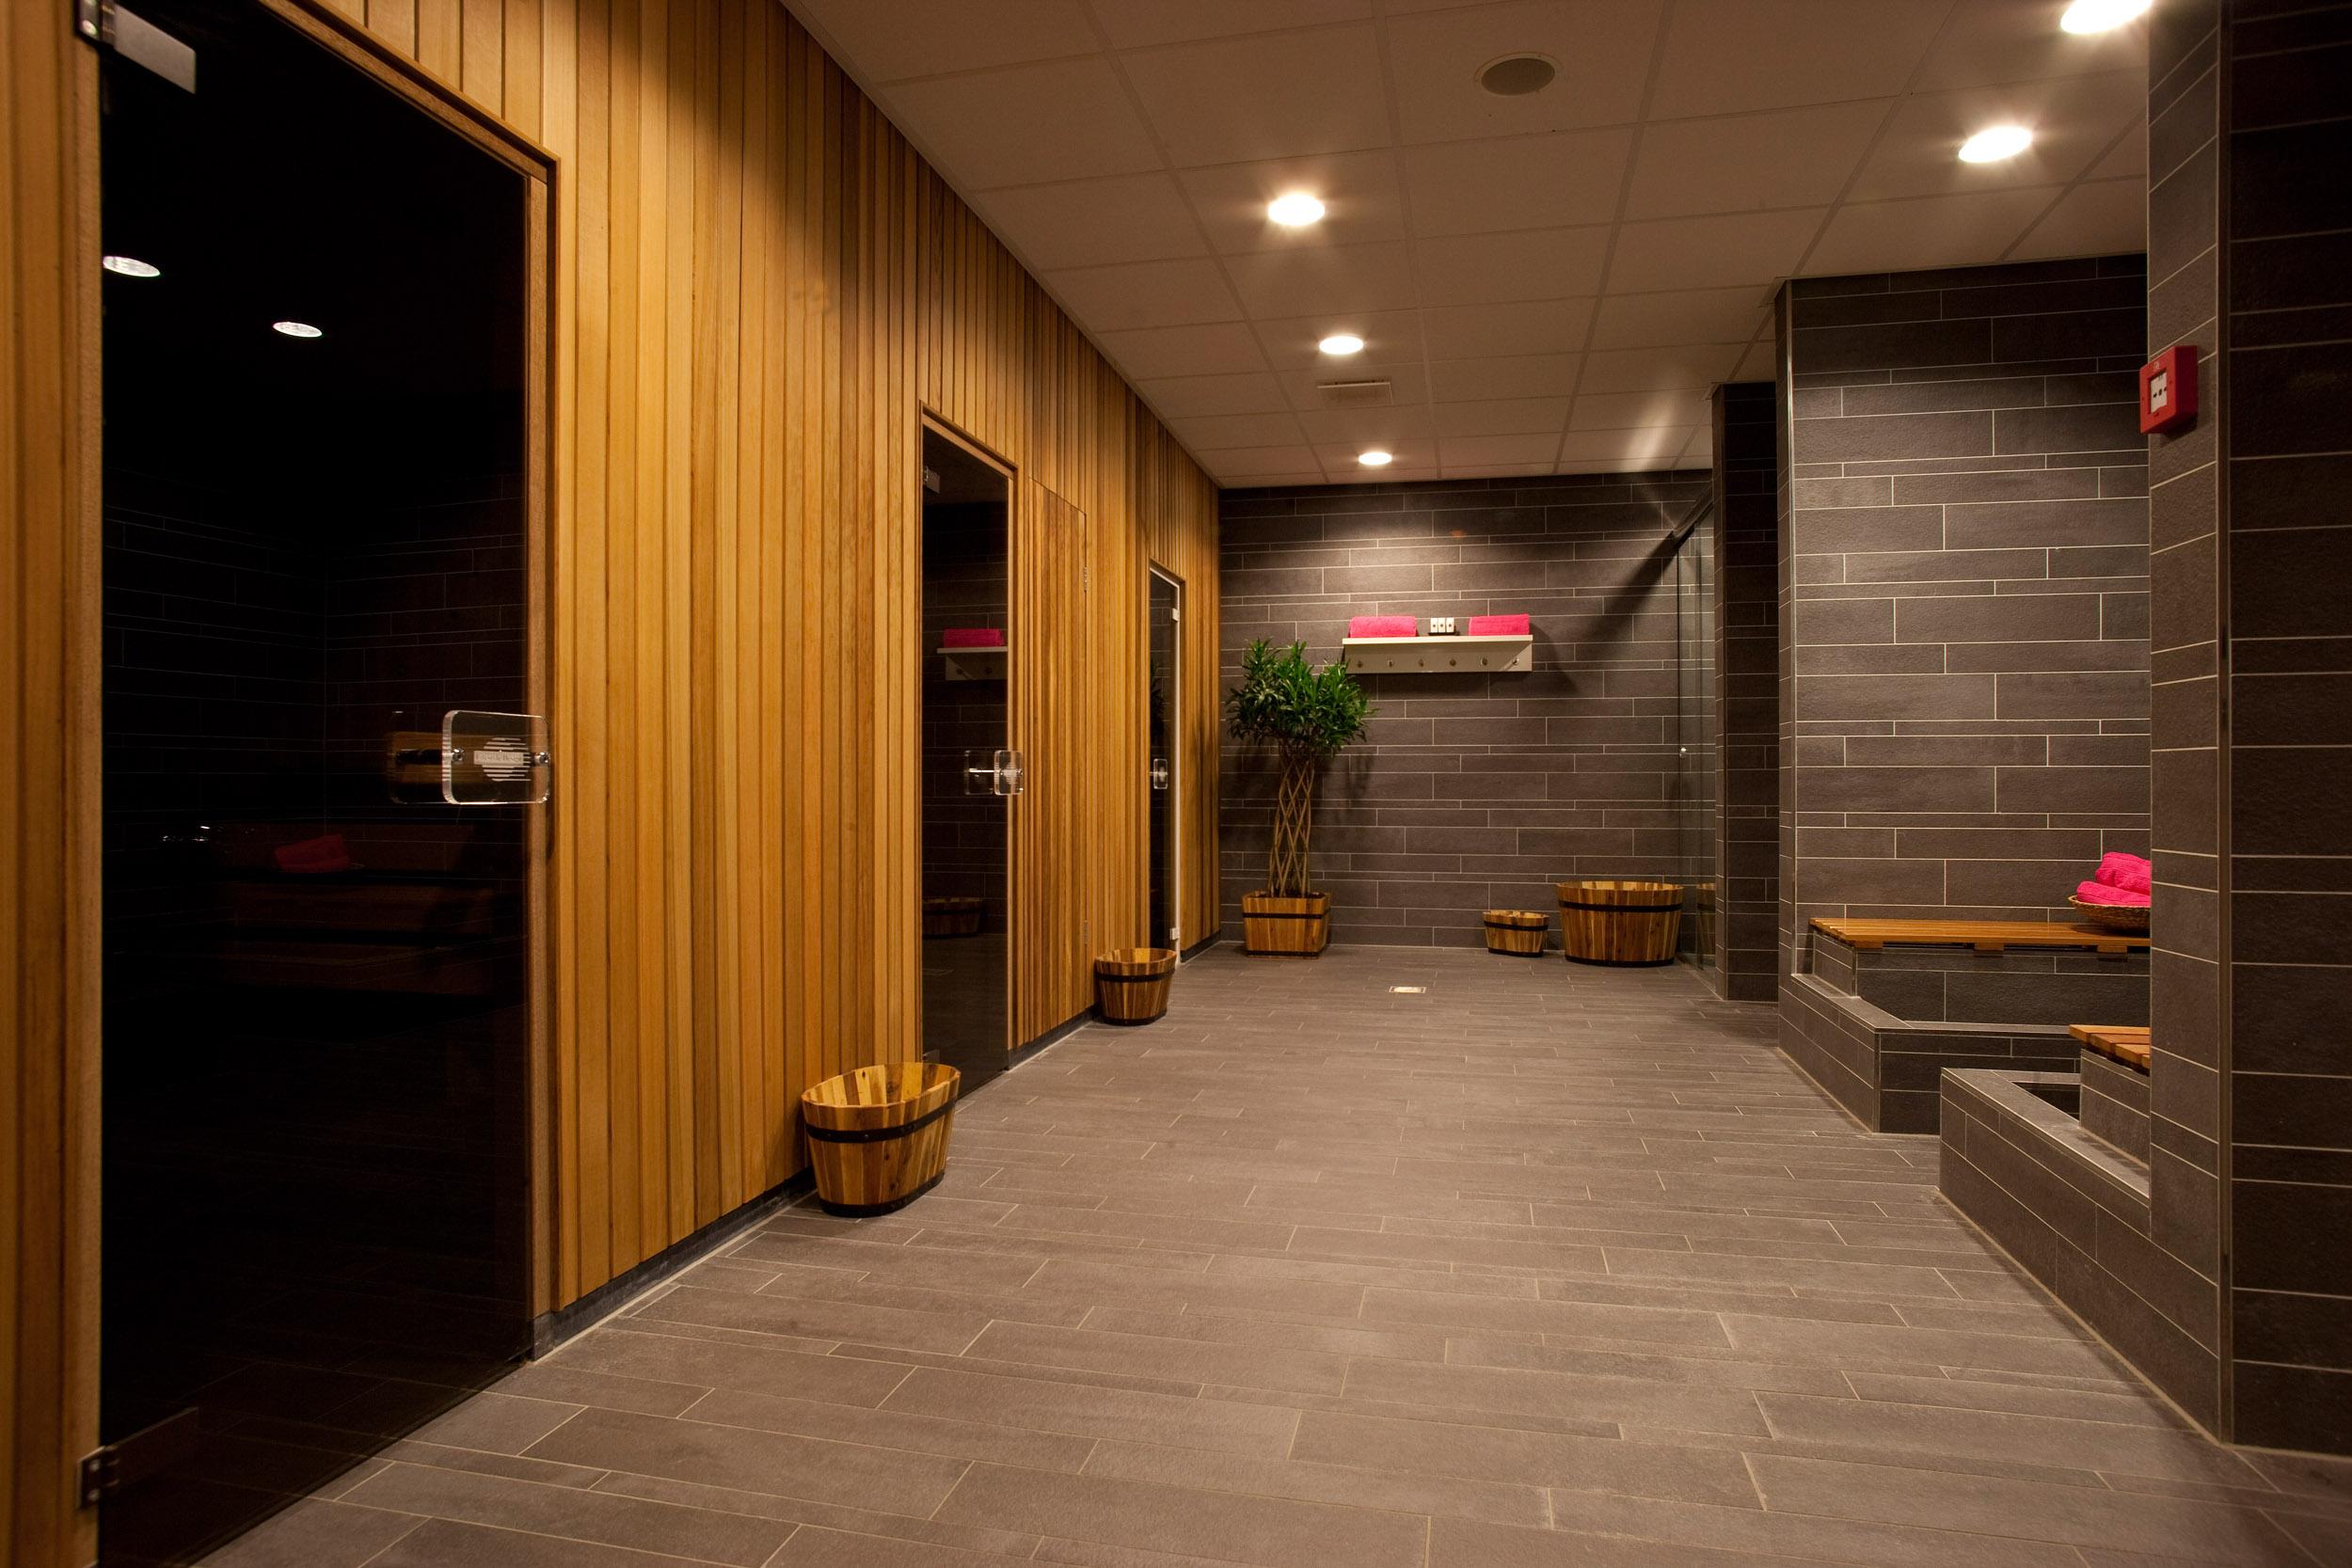 Westcord Hotels Met Wellness Faciliteiten Westcord Hotels